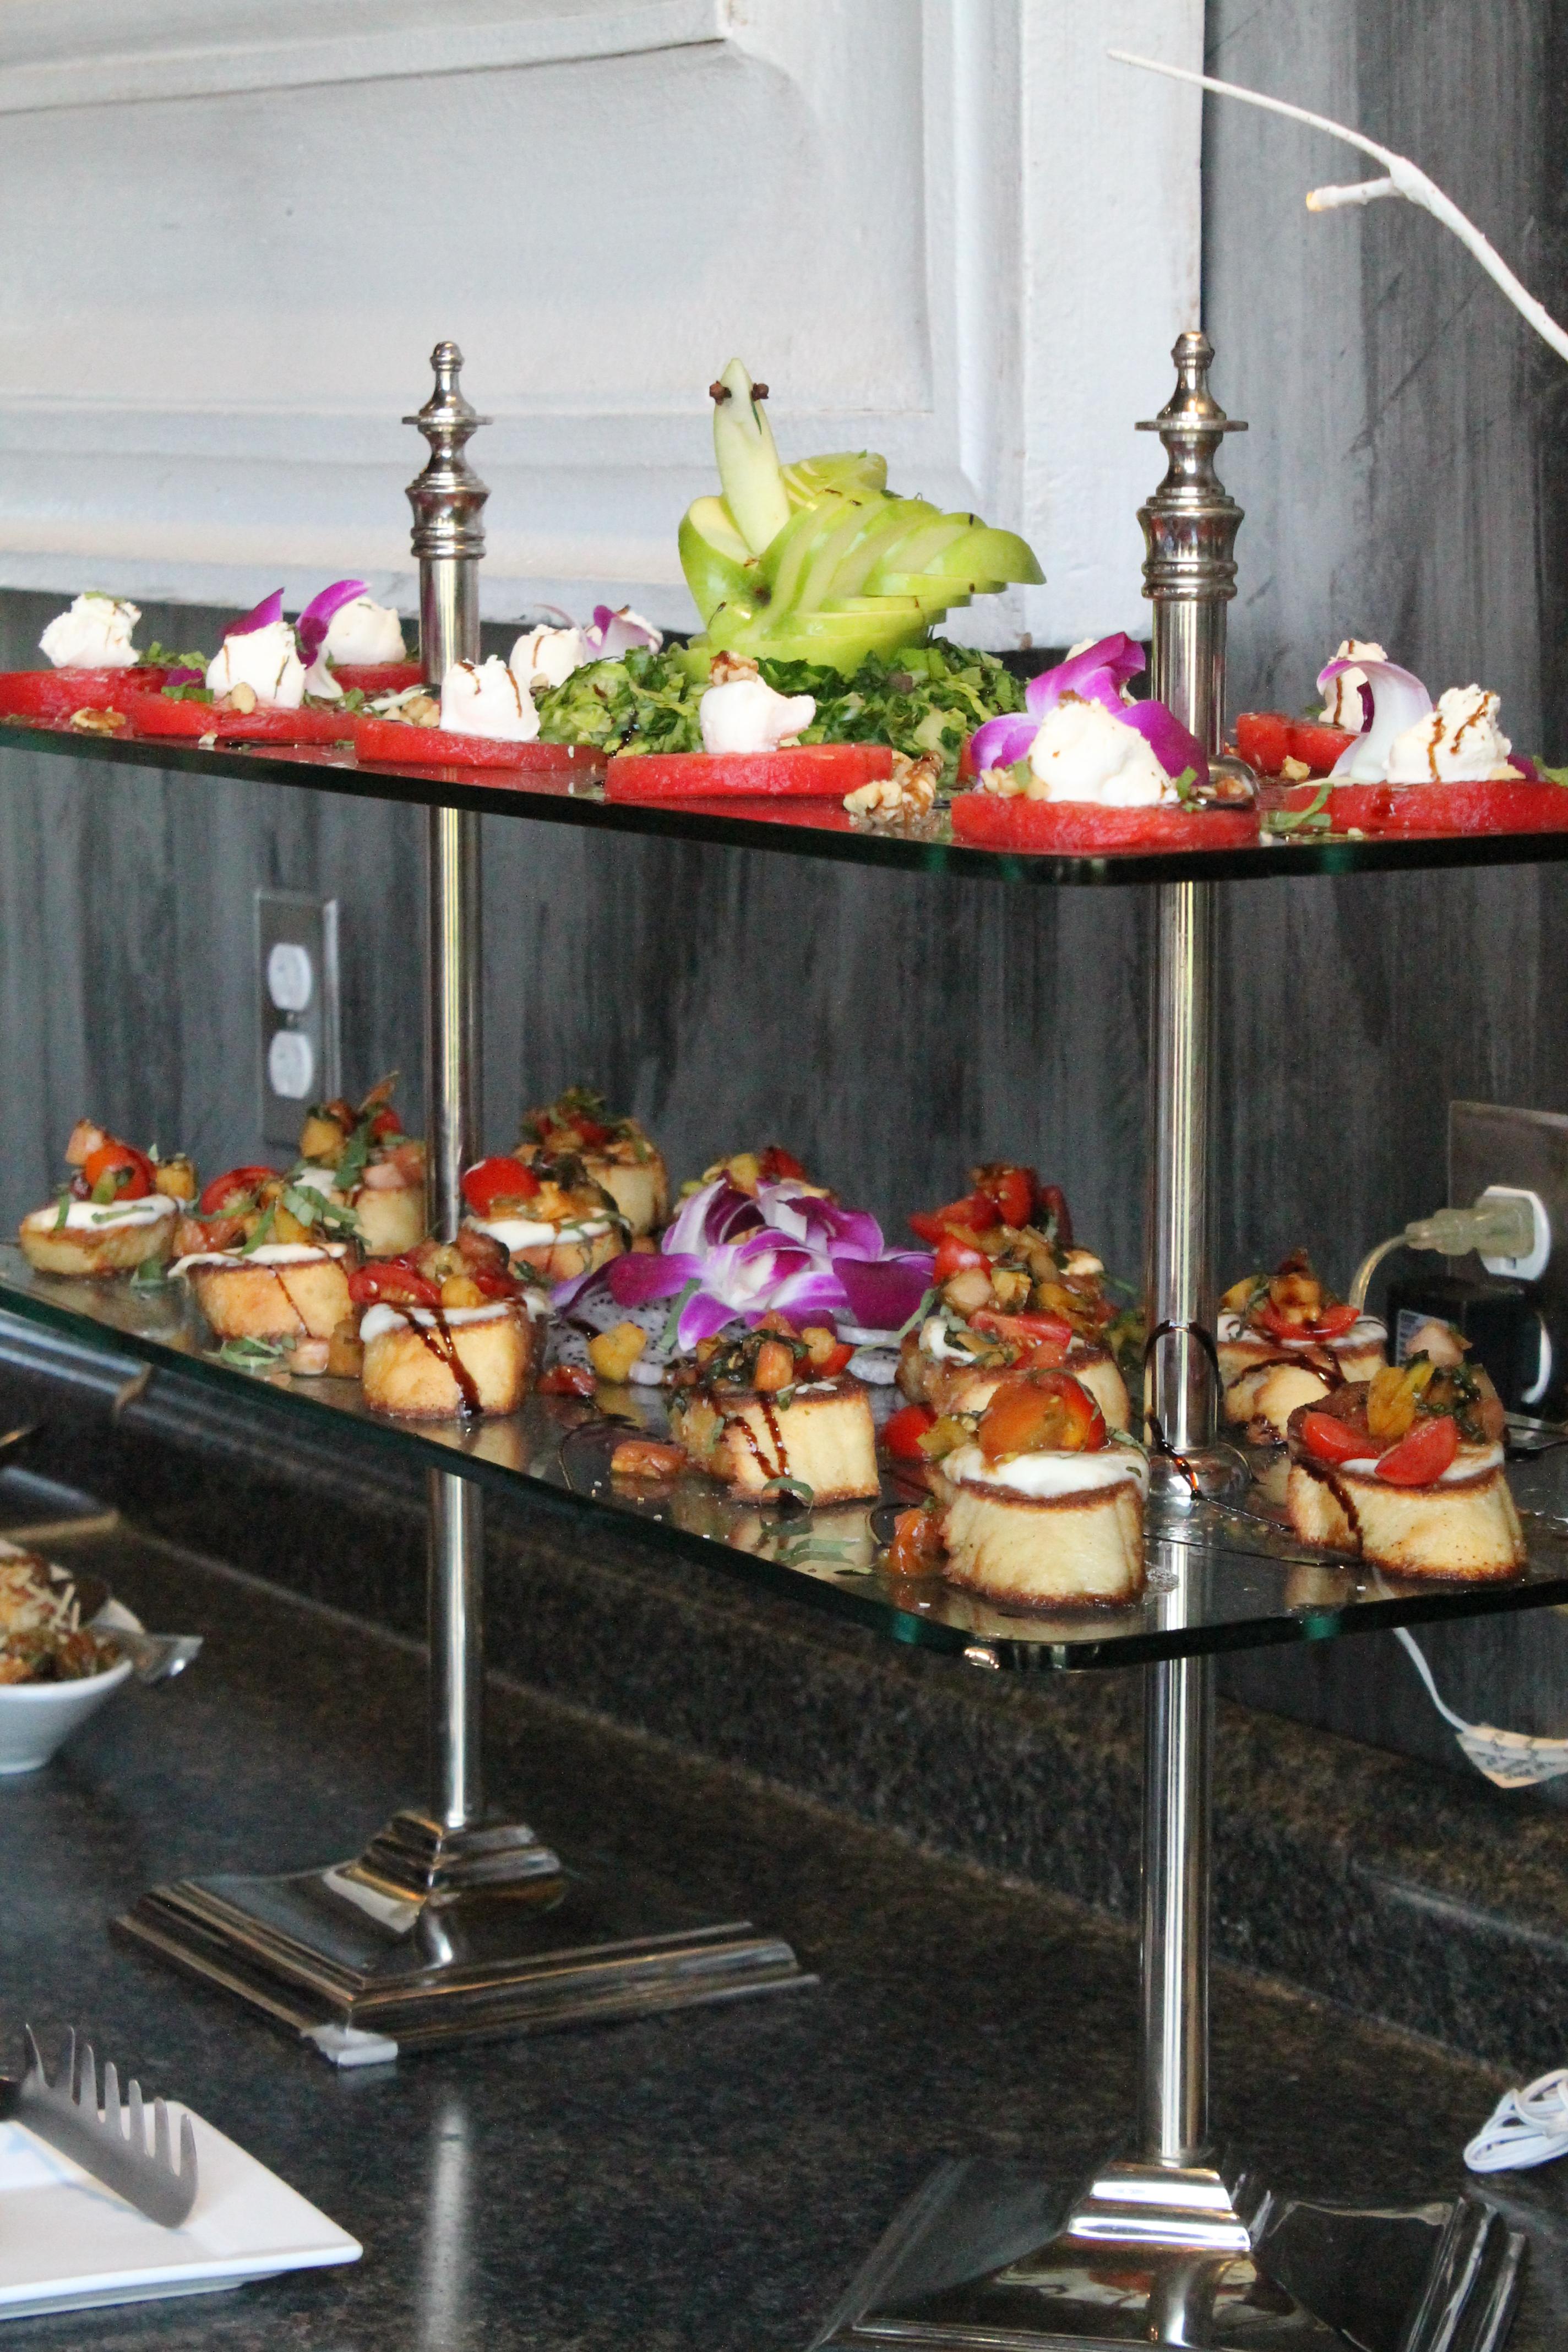 denovo-13 Impressionnant De Table Conforama Cuisine Concept